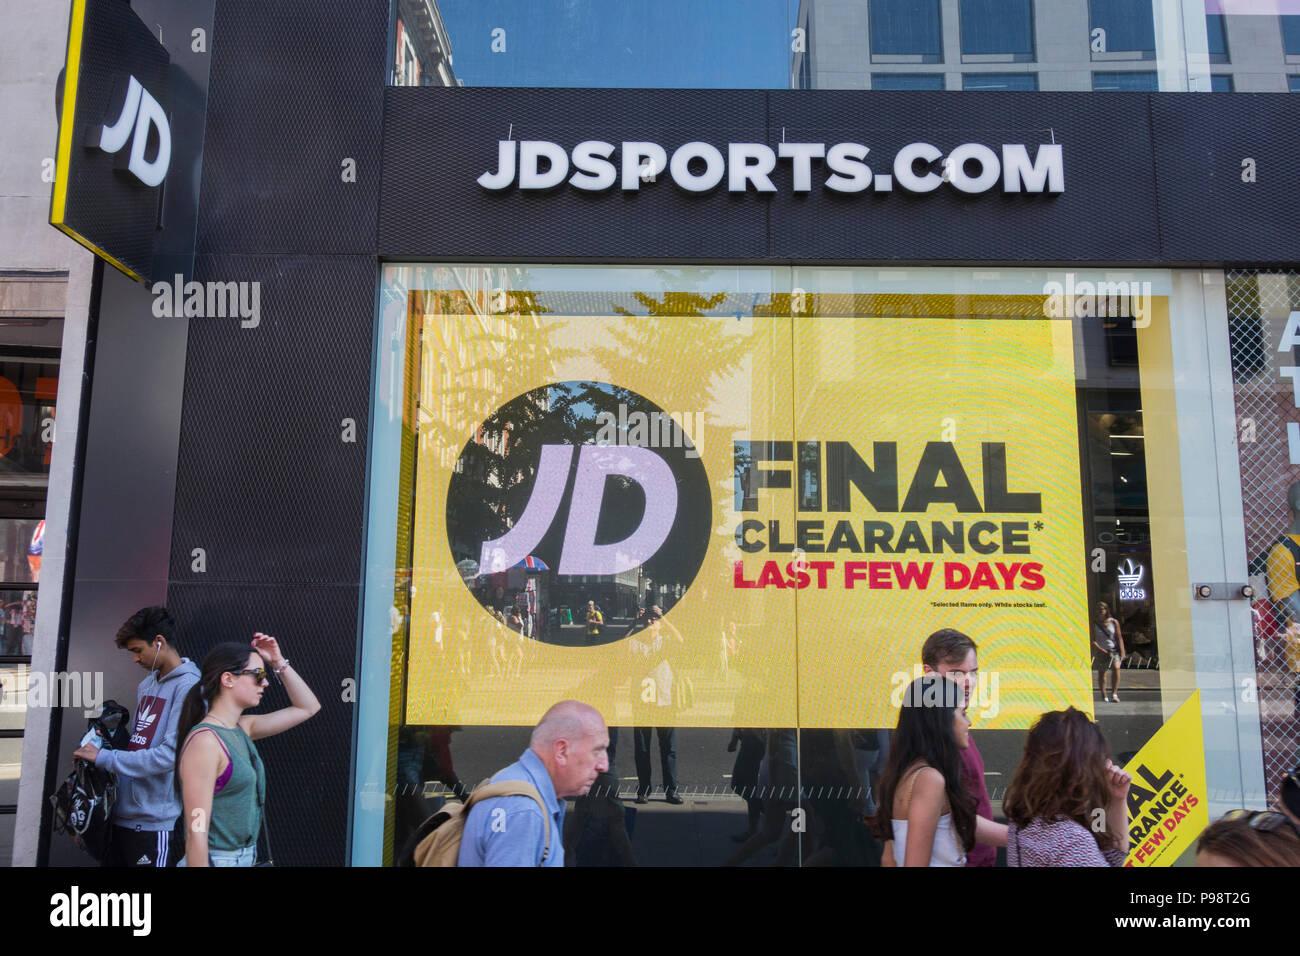 Jd Sports Shop Summer Sale Oxford Street London Uk Stock Photo Alamy